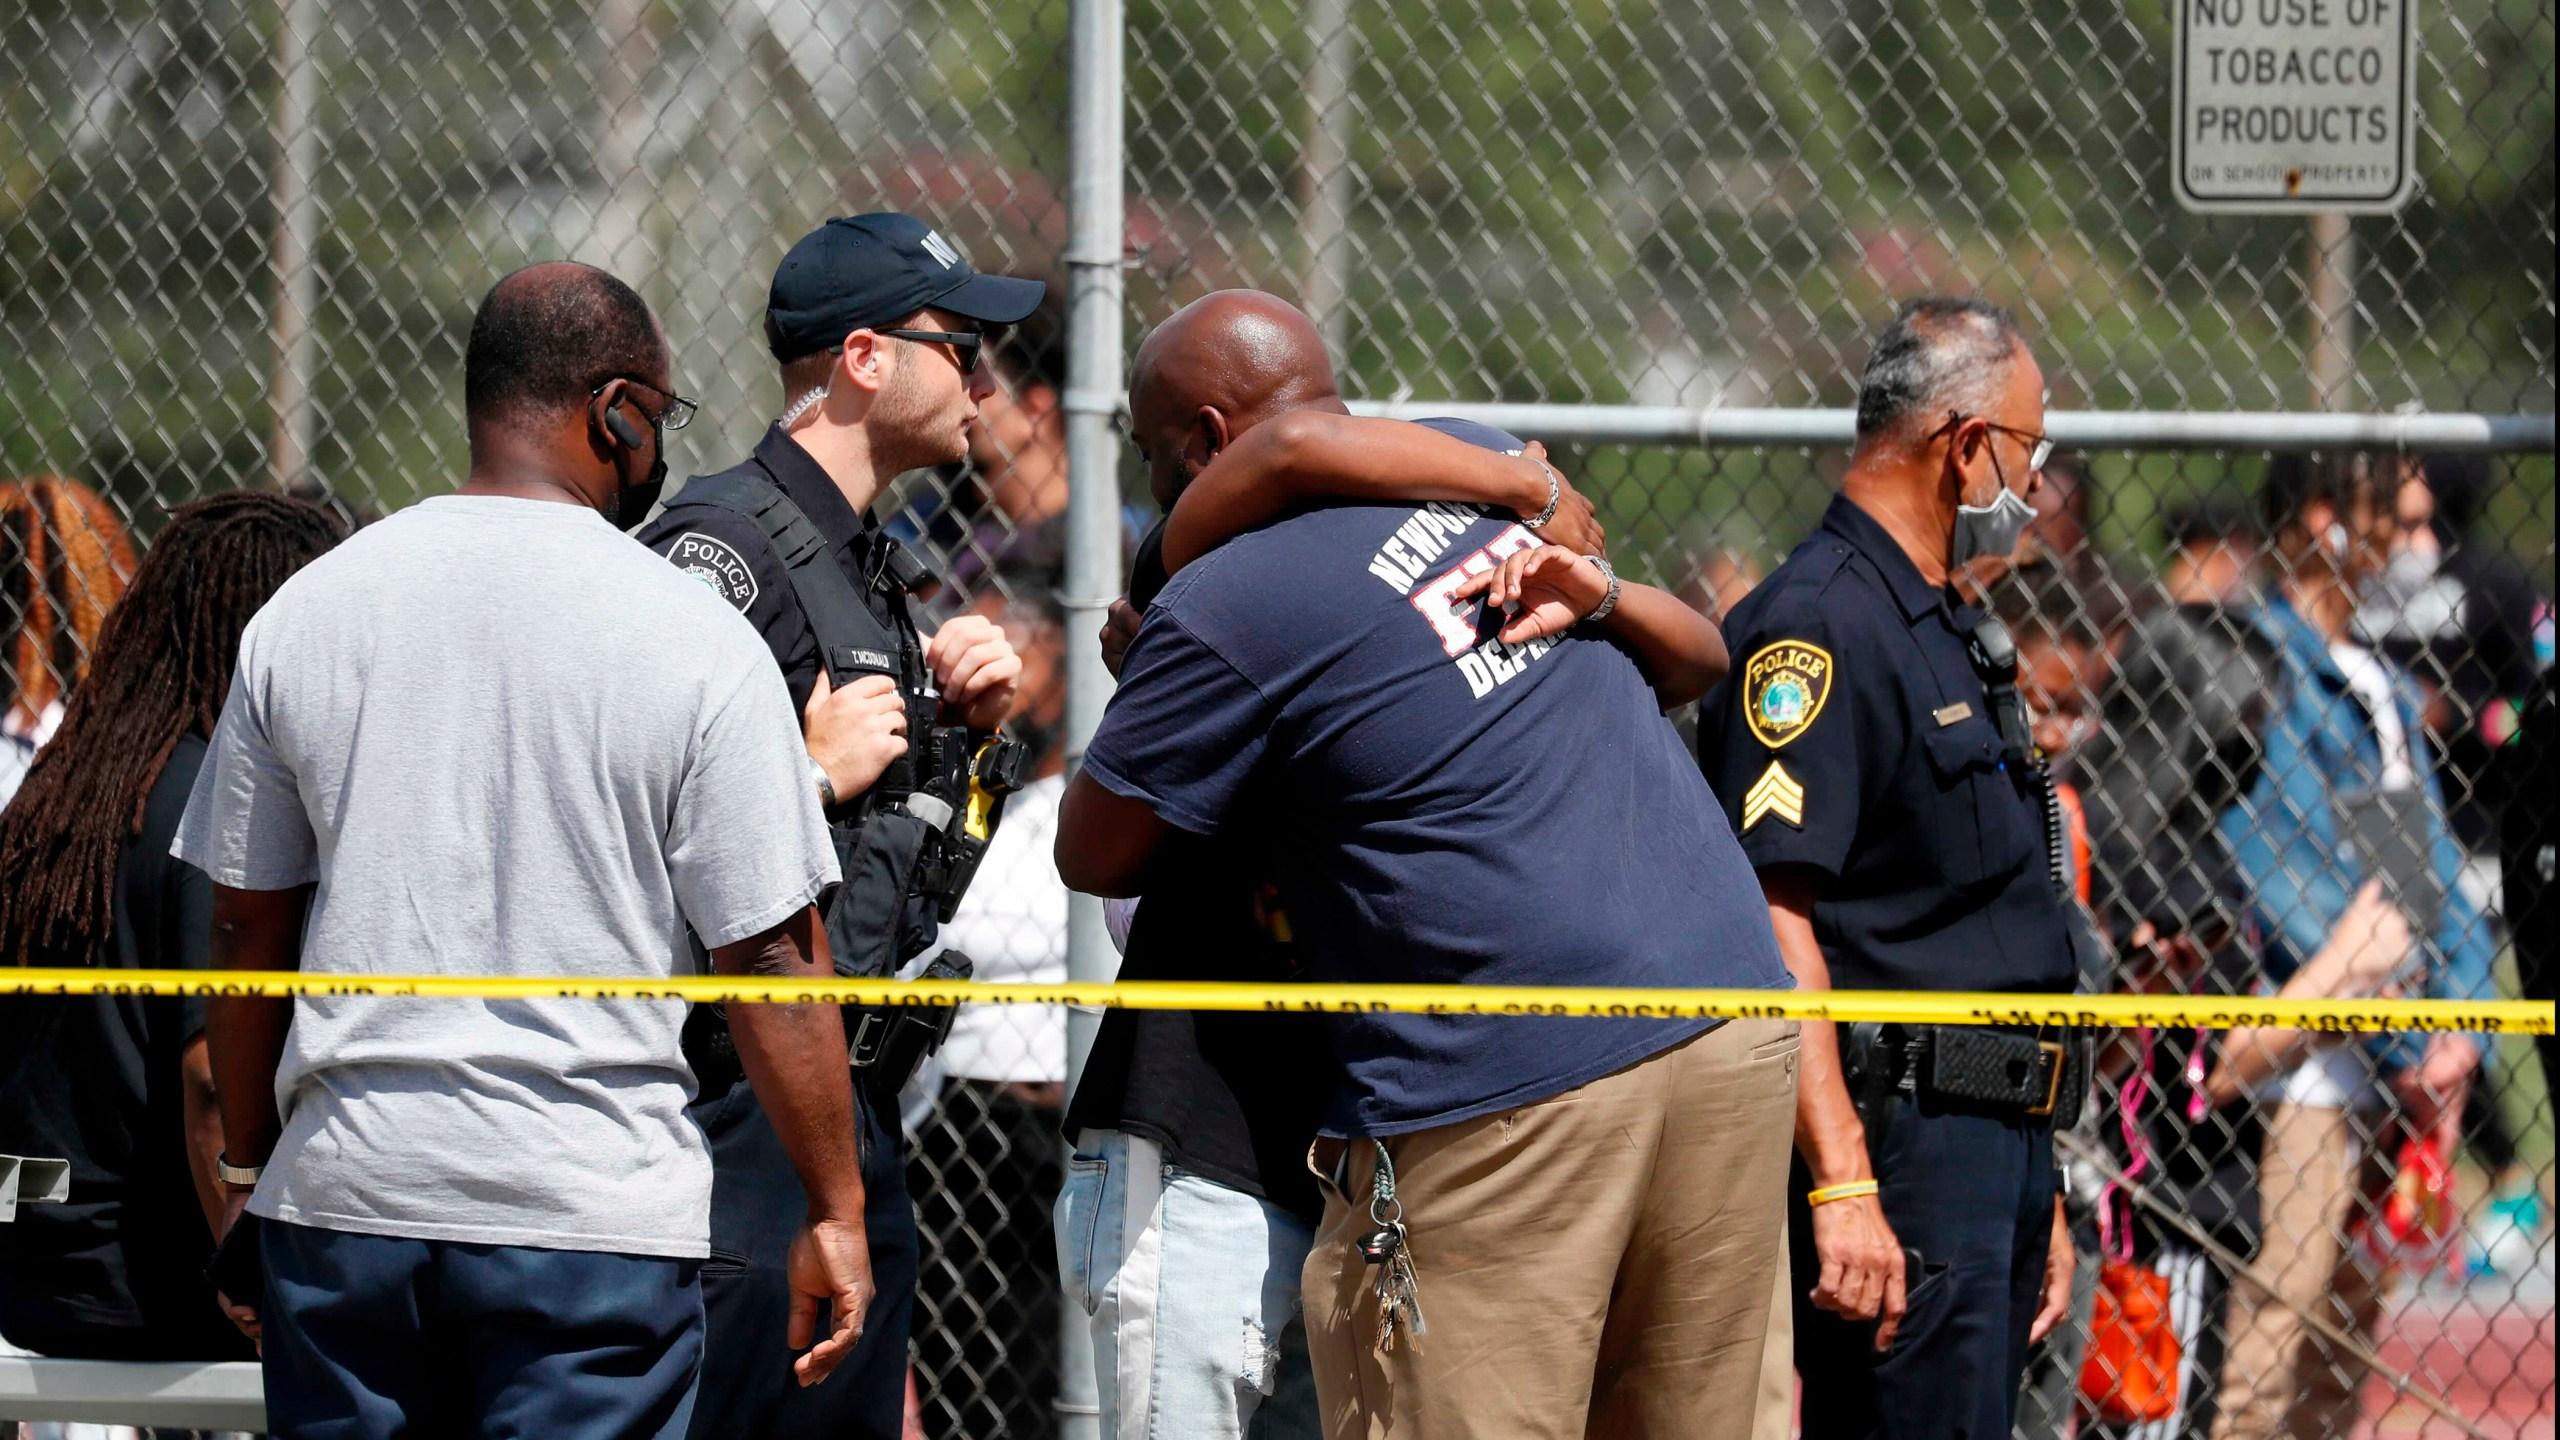 People embrace outside Heritage High School as Newport News Police are on scene responding to a shooting incident Monday, Sept. 20, 2021 in Newport News, Va. (Jonathon Gruenke/The Virginian-Pilot via AP)